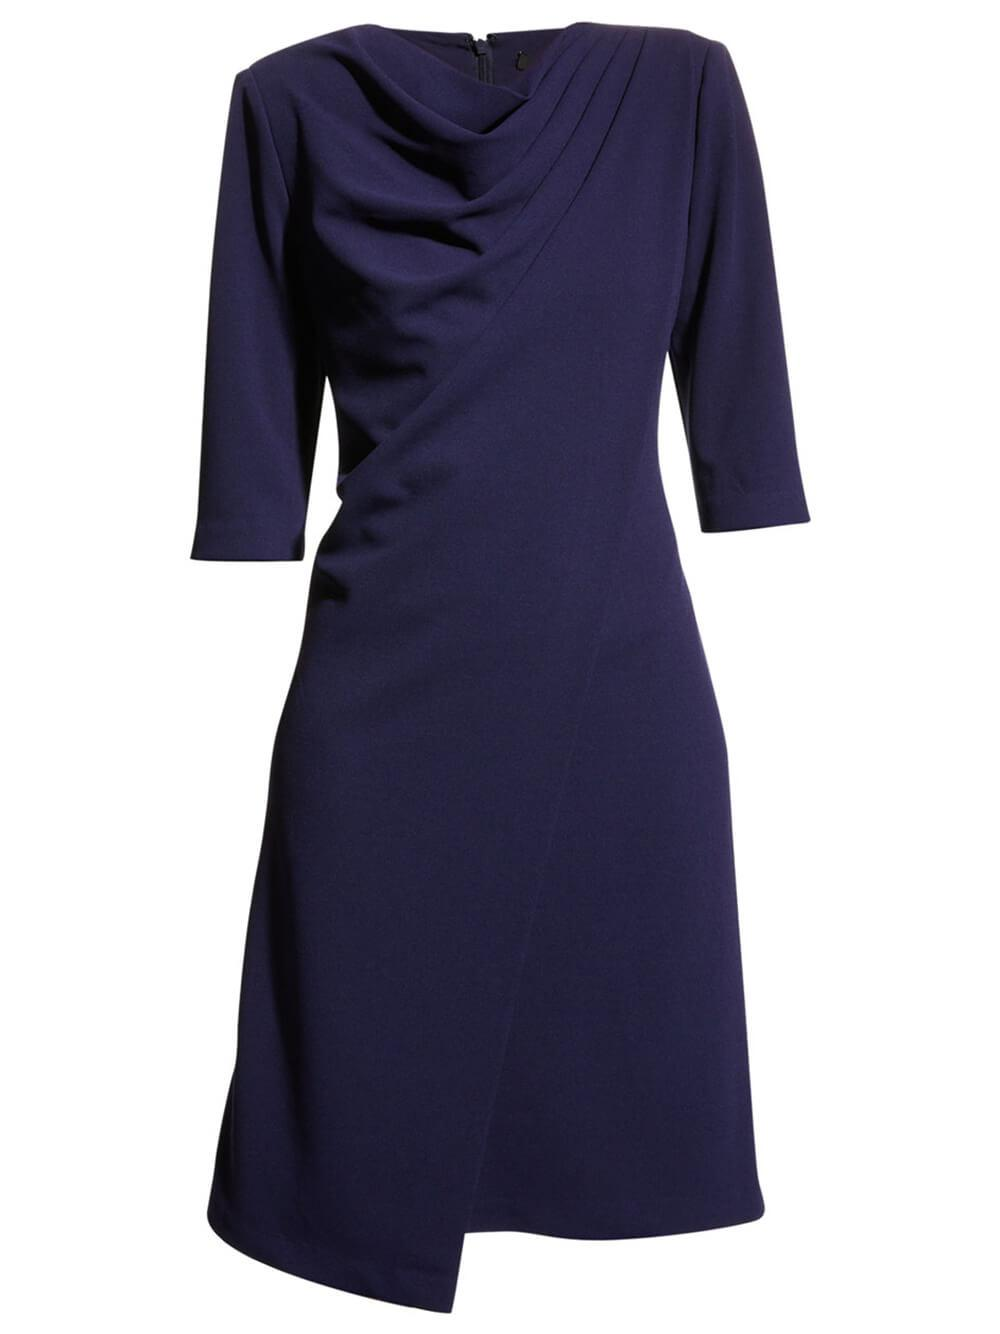 Draped High Neck Dress